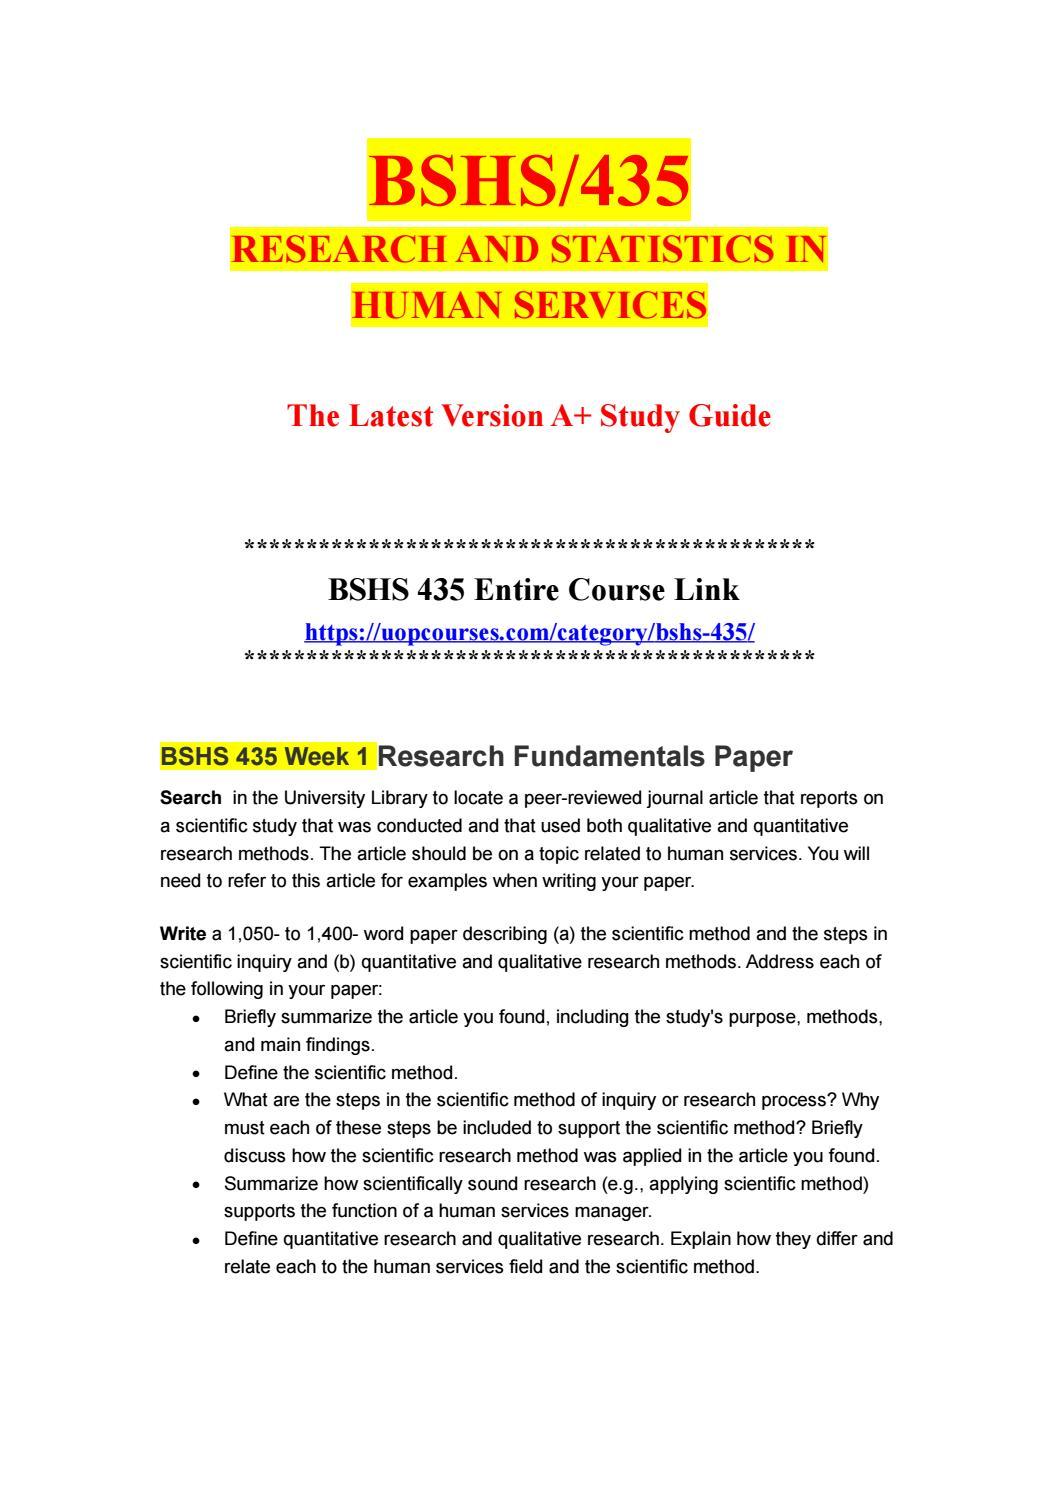 BSHS 435 Week 5 Descriptive and Inferential Statistics